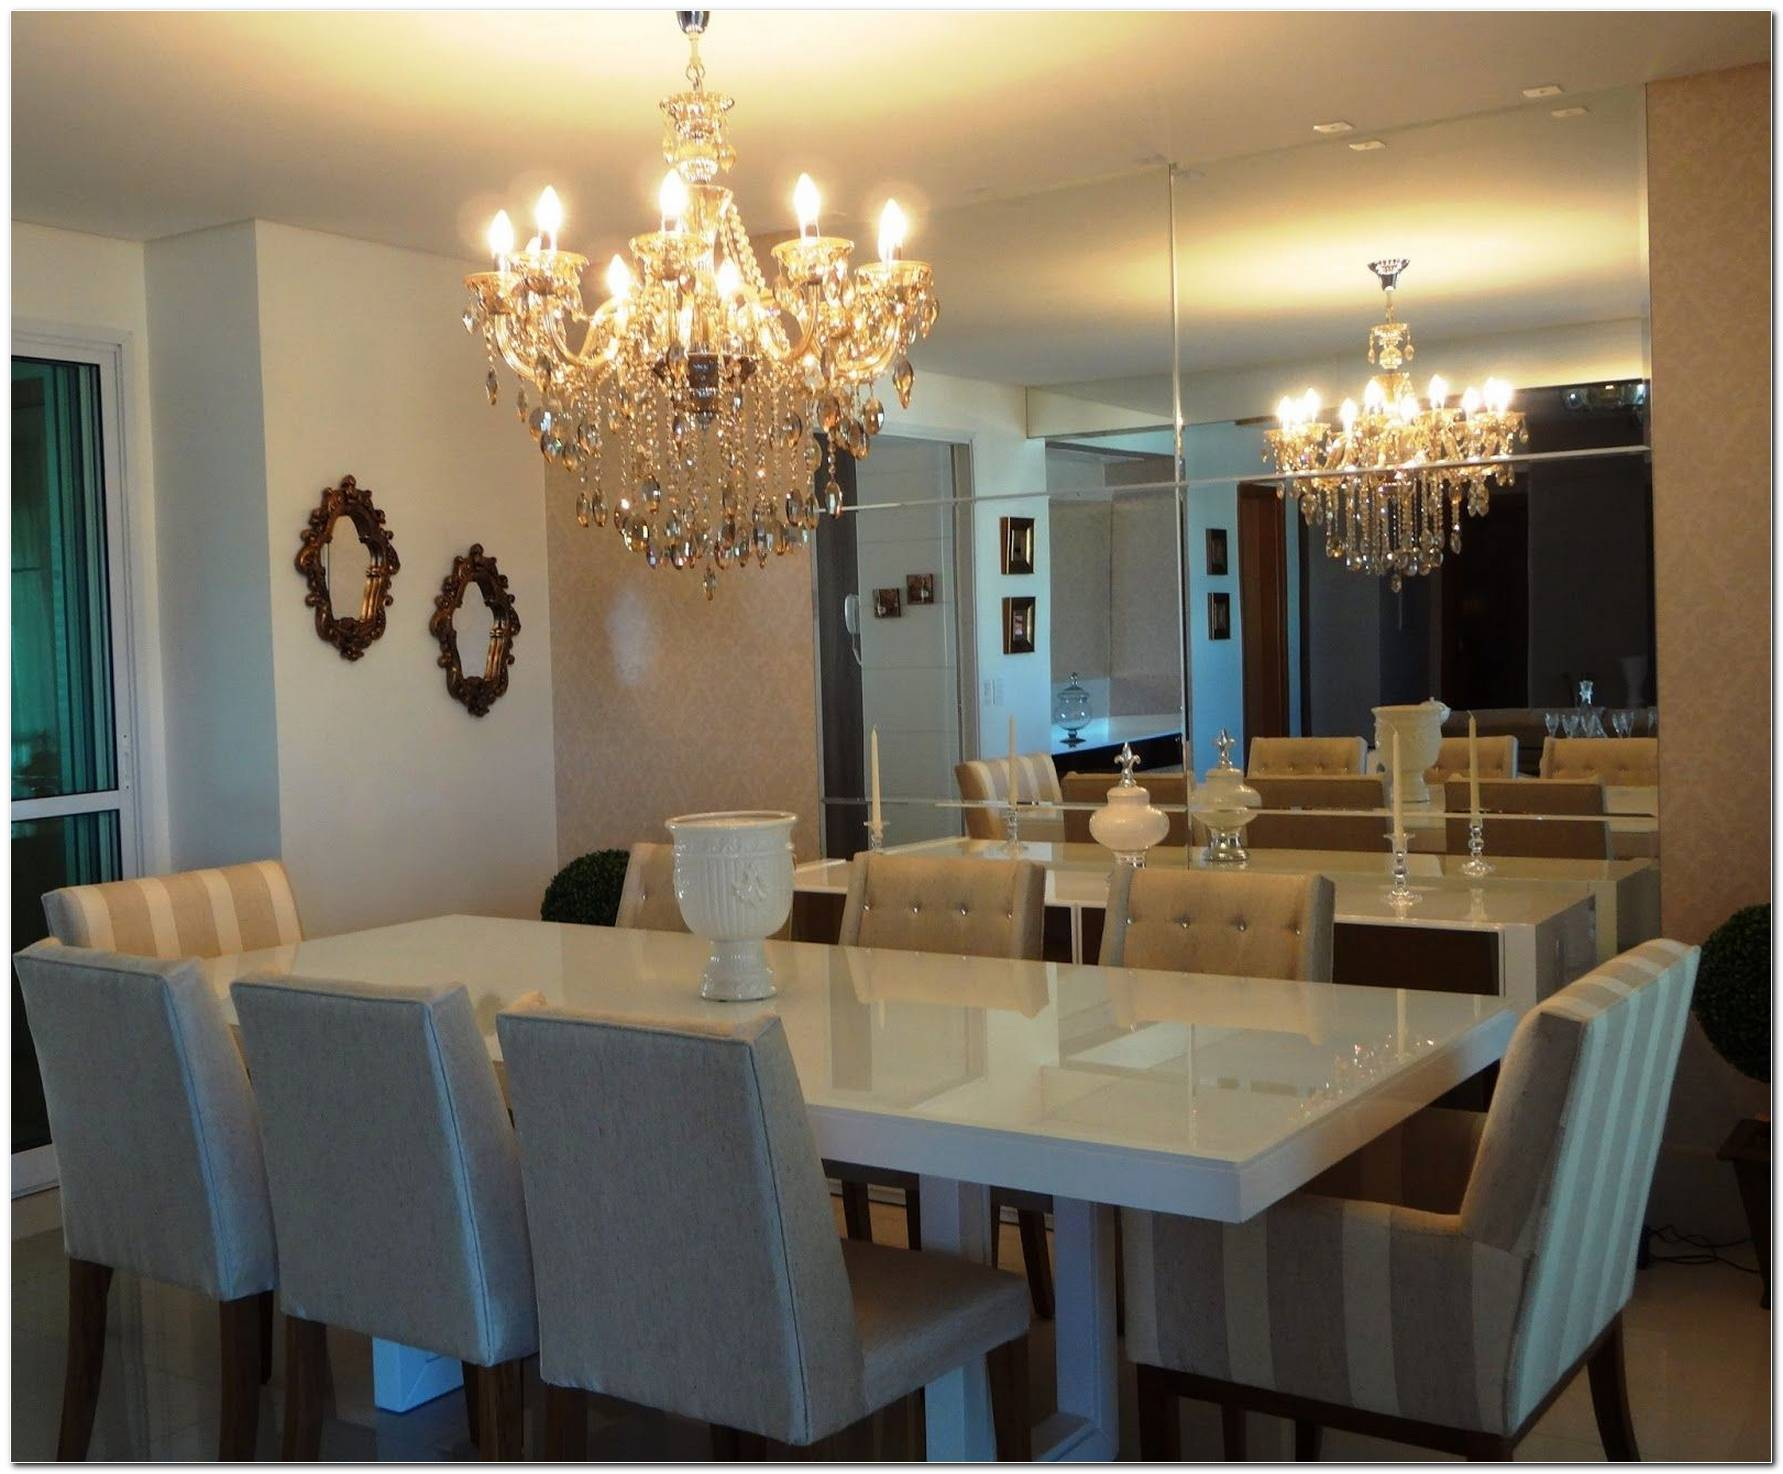 Mesa De Jantar Quadrada 95 Modelos Bel%C3%ADssimos Para Sala De Jantar